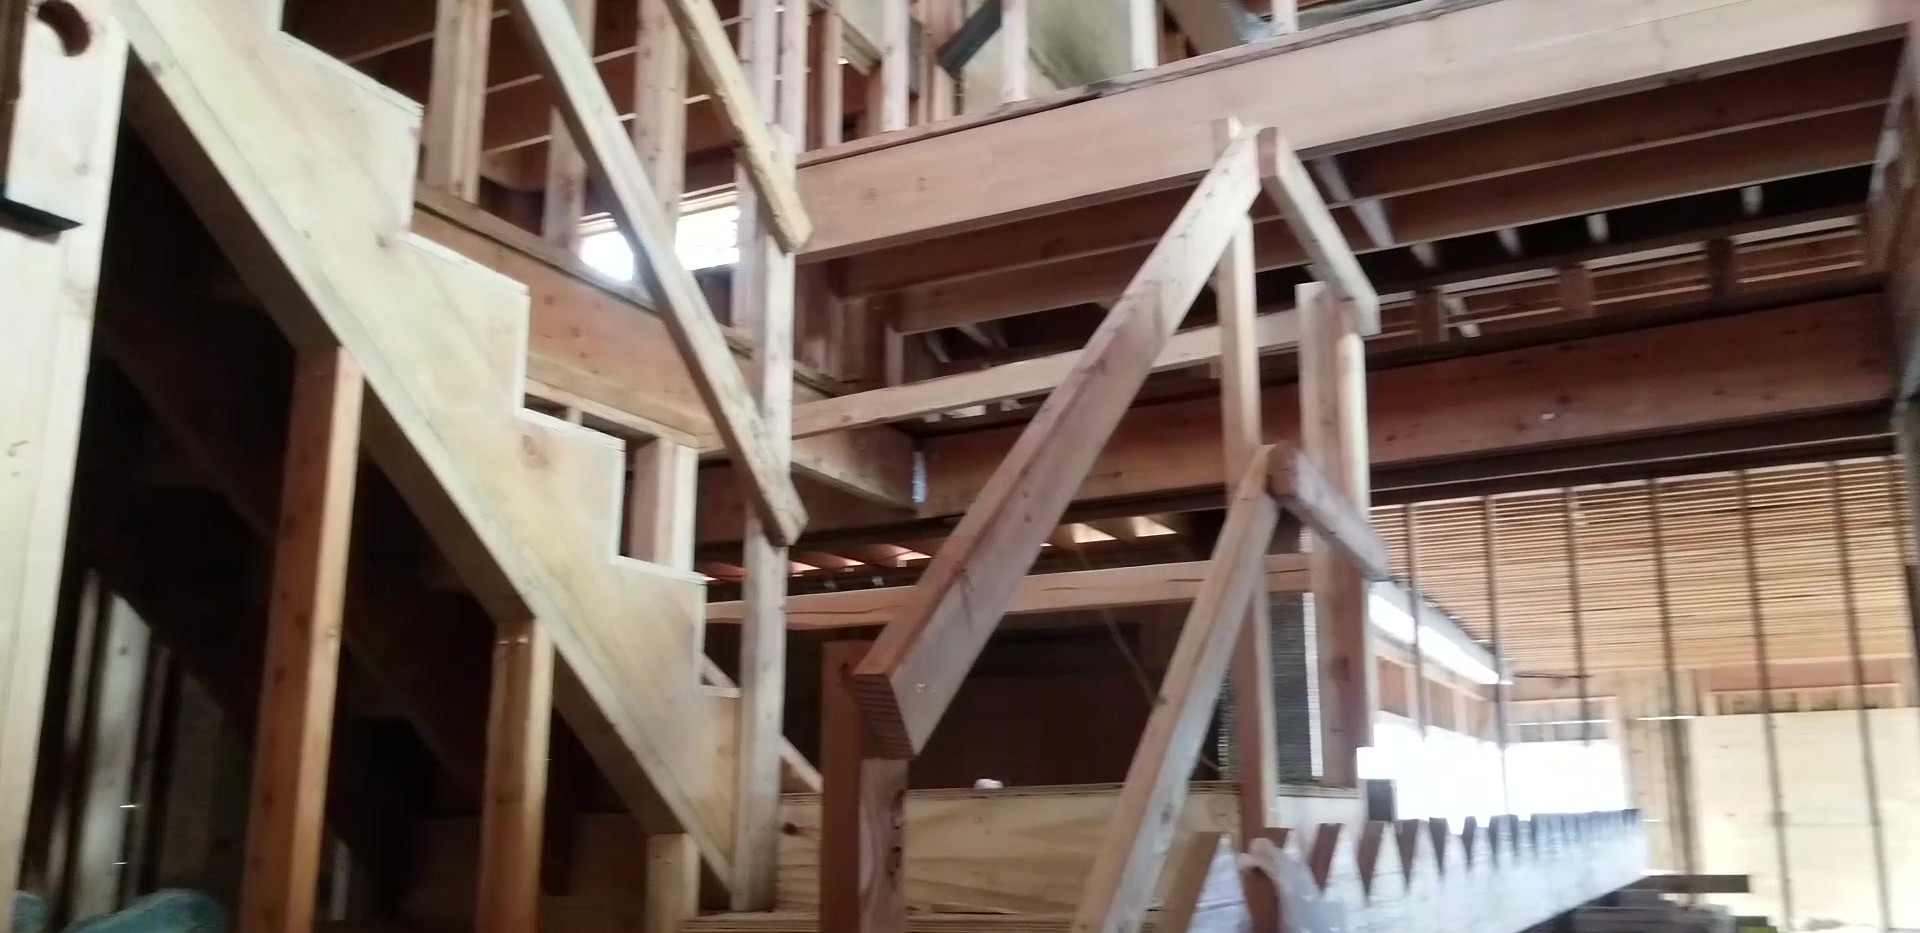 961 Carlton blvd progress video update